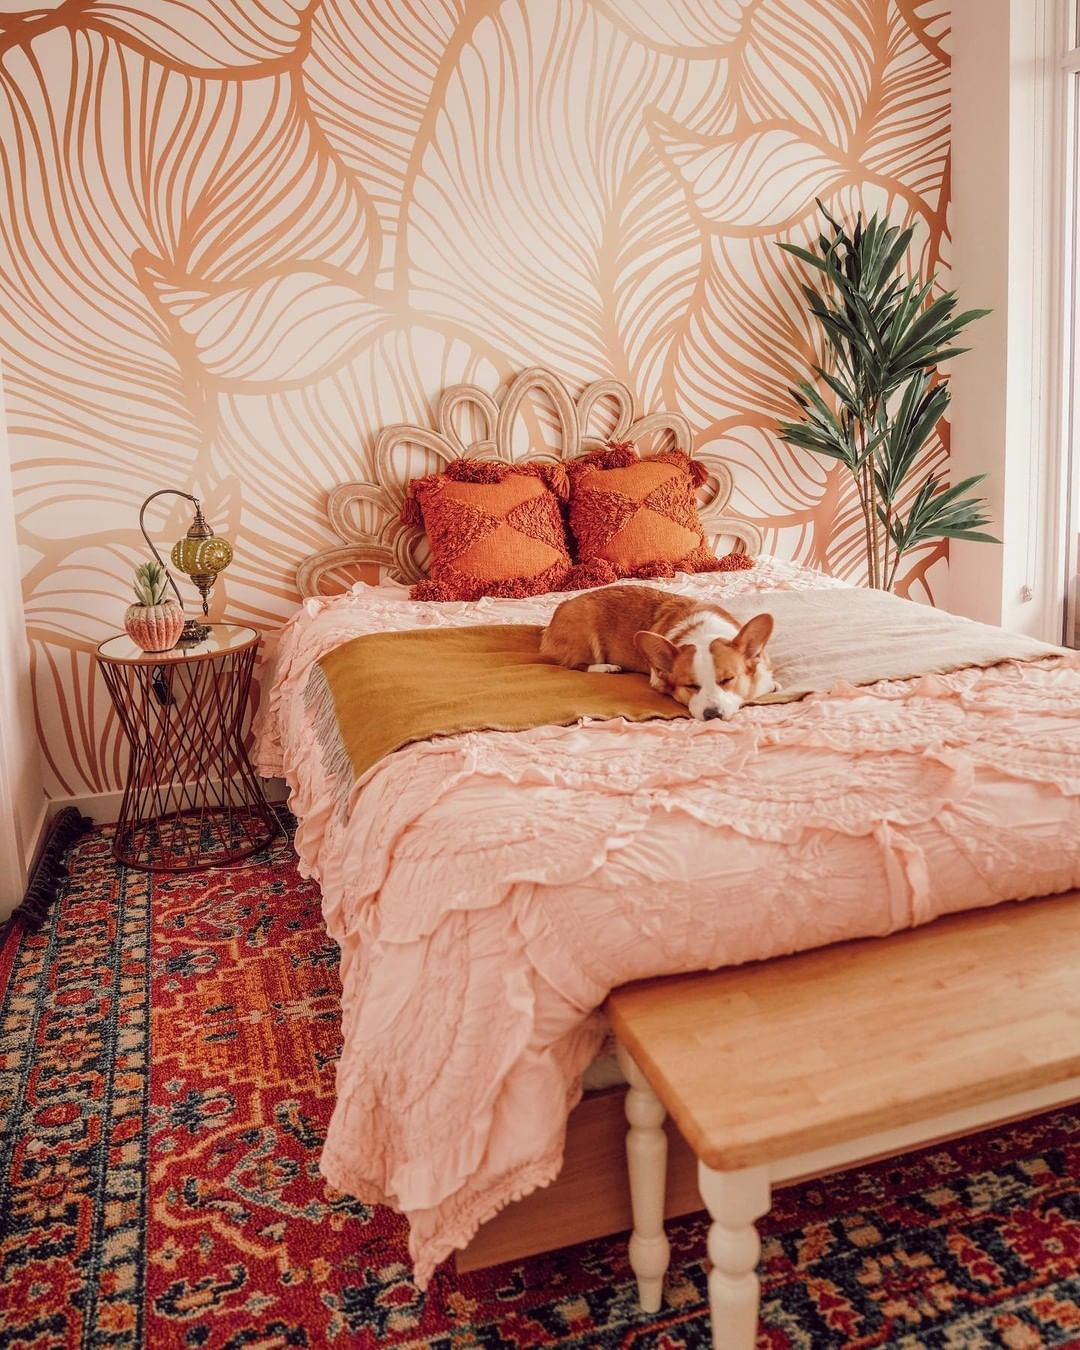 interior decor trends 2020 (10)